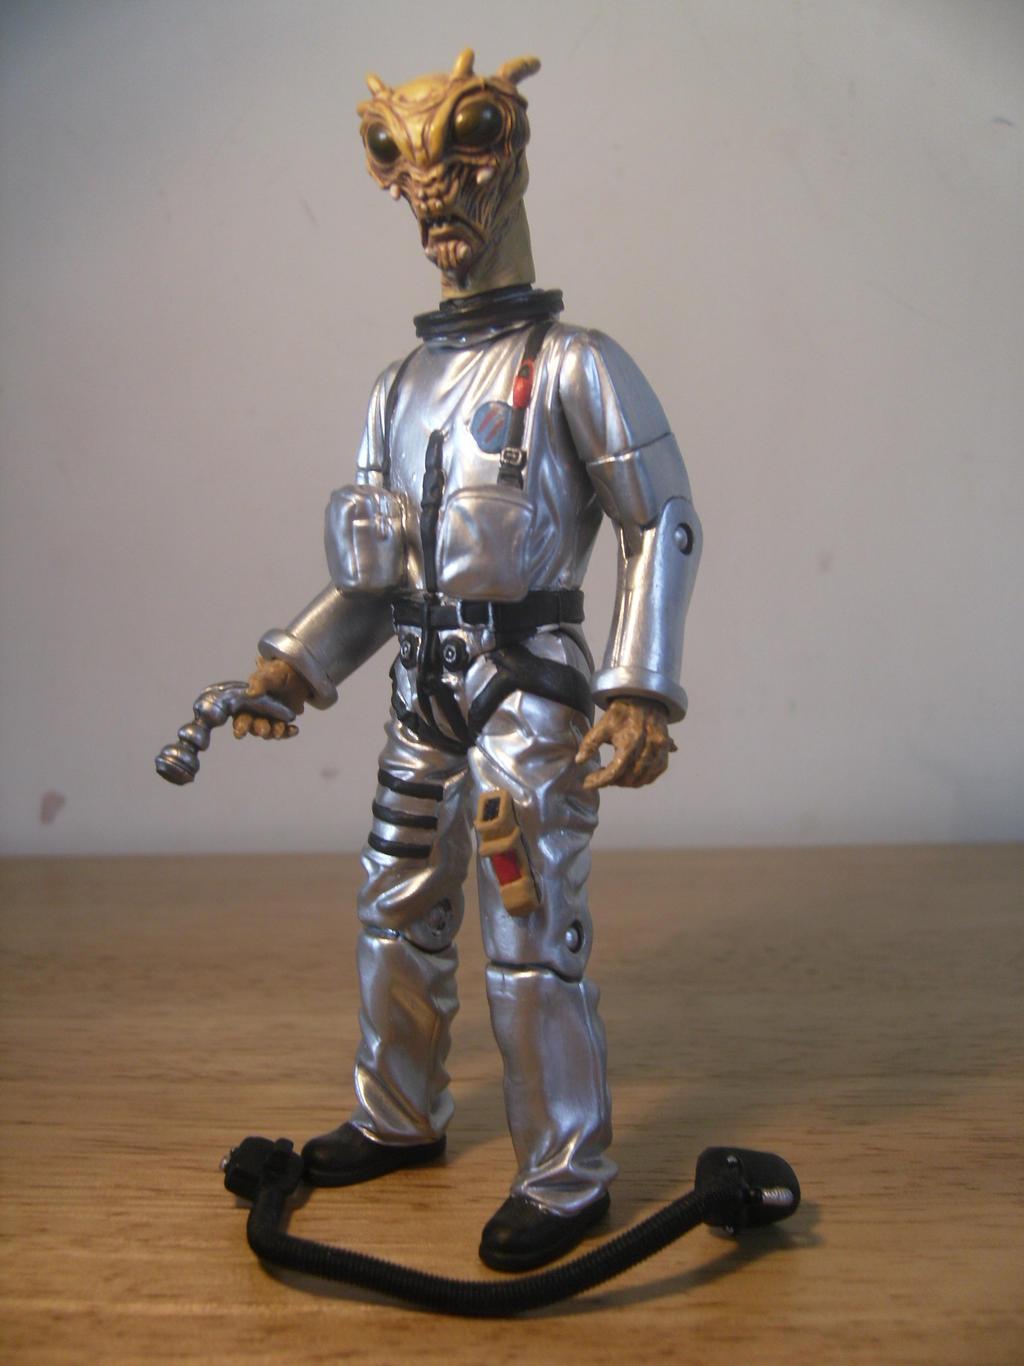 custom doctor who figure by alvin171 on deviantart